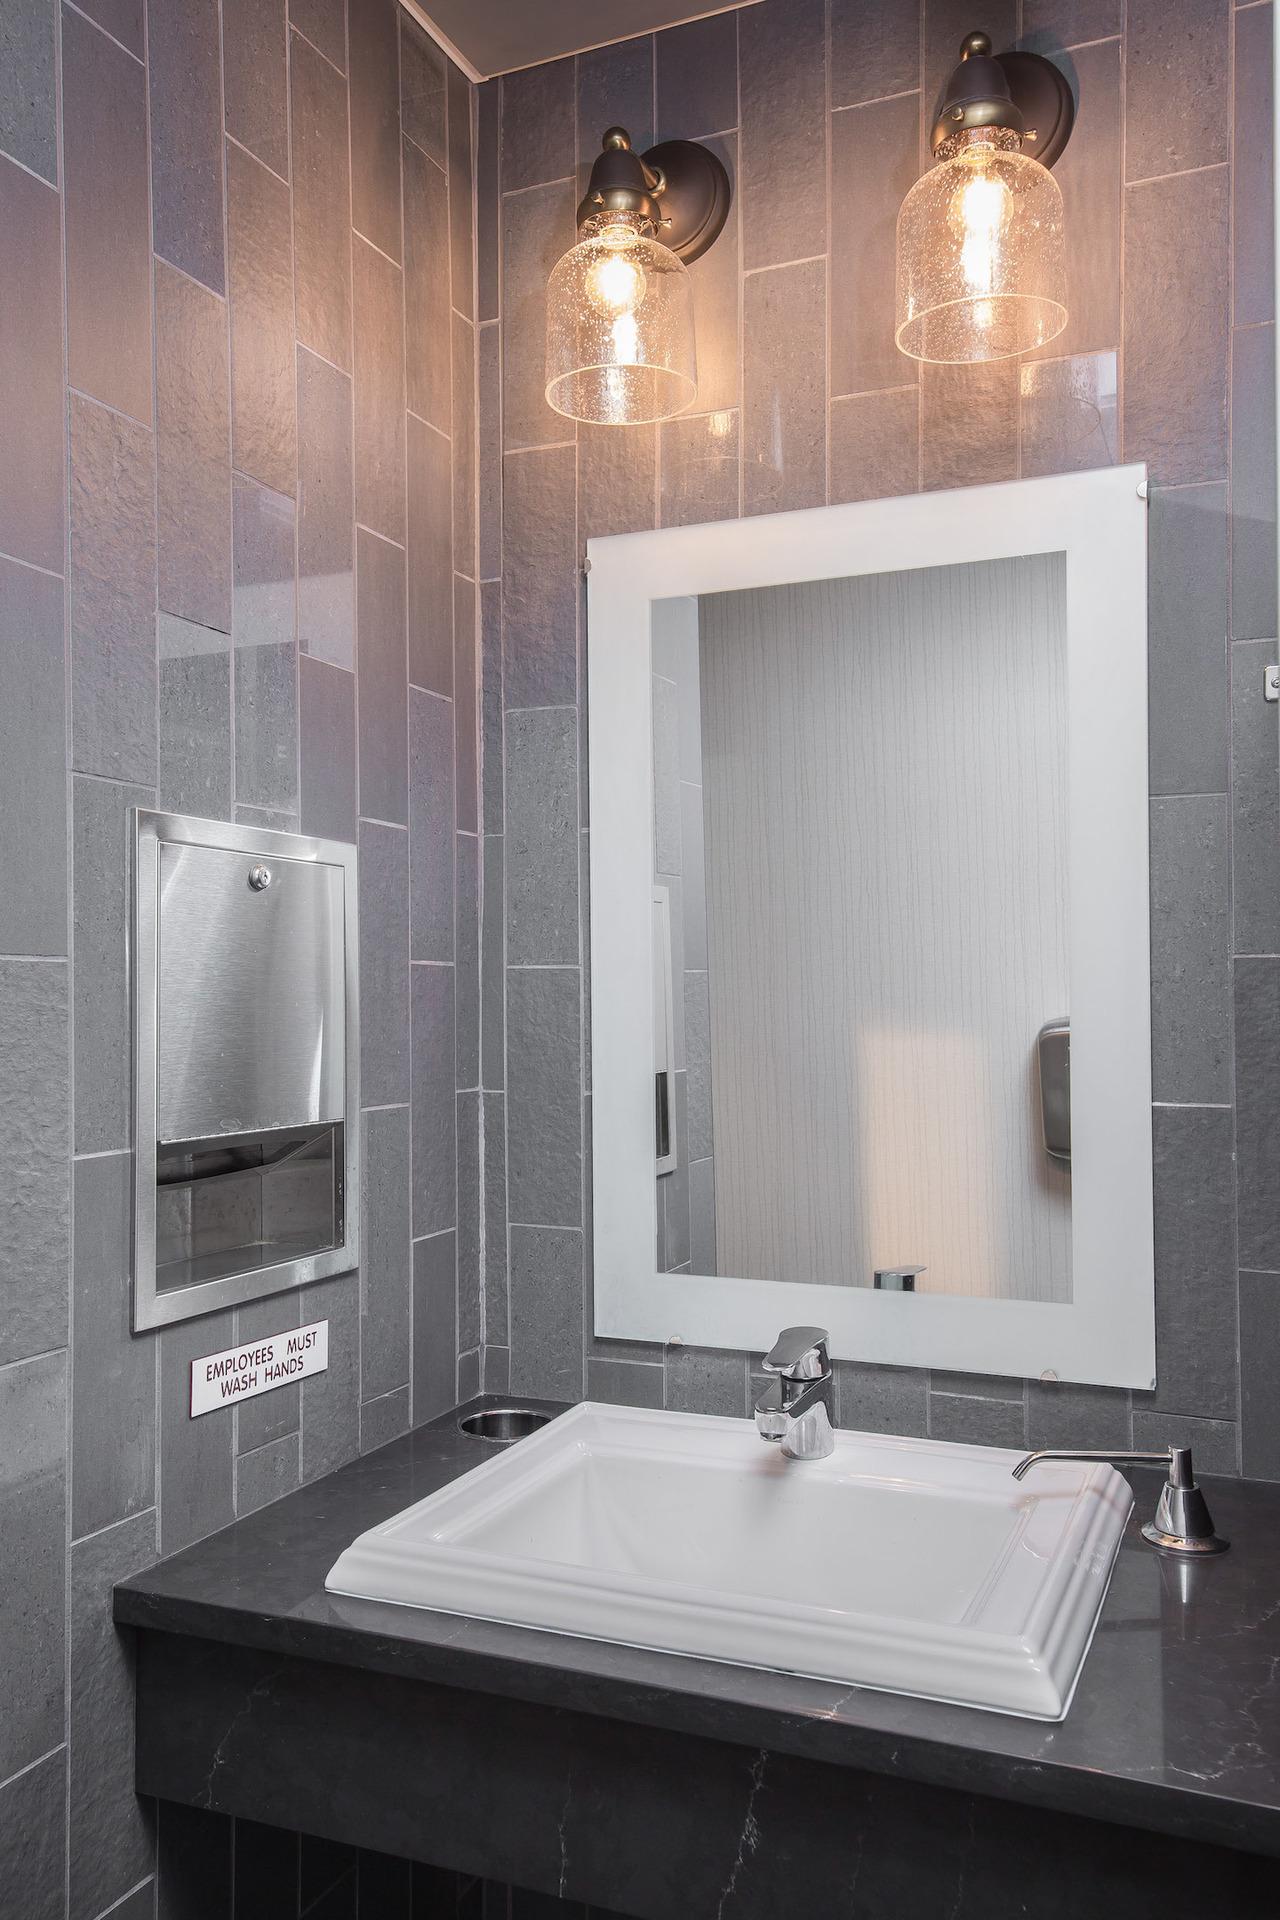 Bathroom fixtures at the North Shore Inn in Benton Harbor, Michigan.